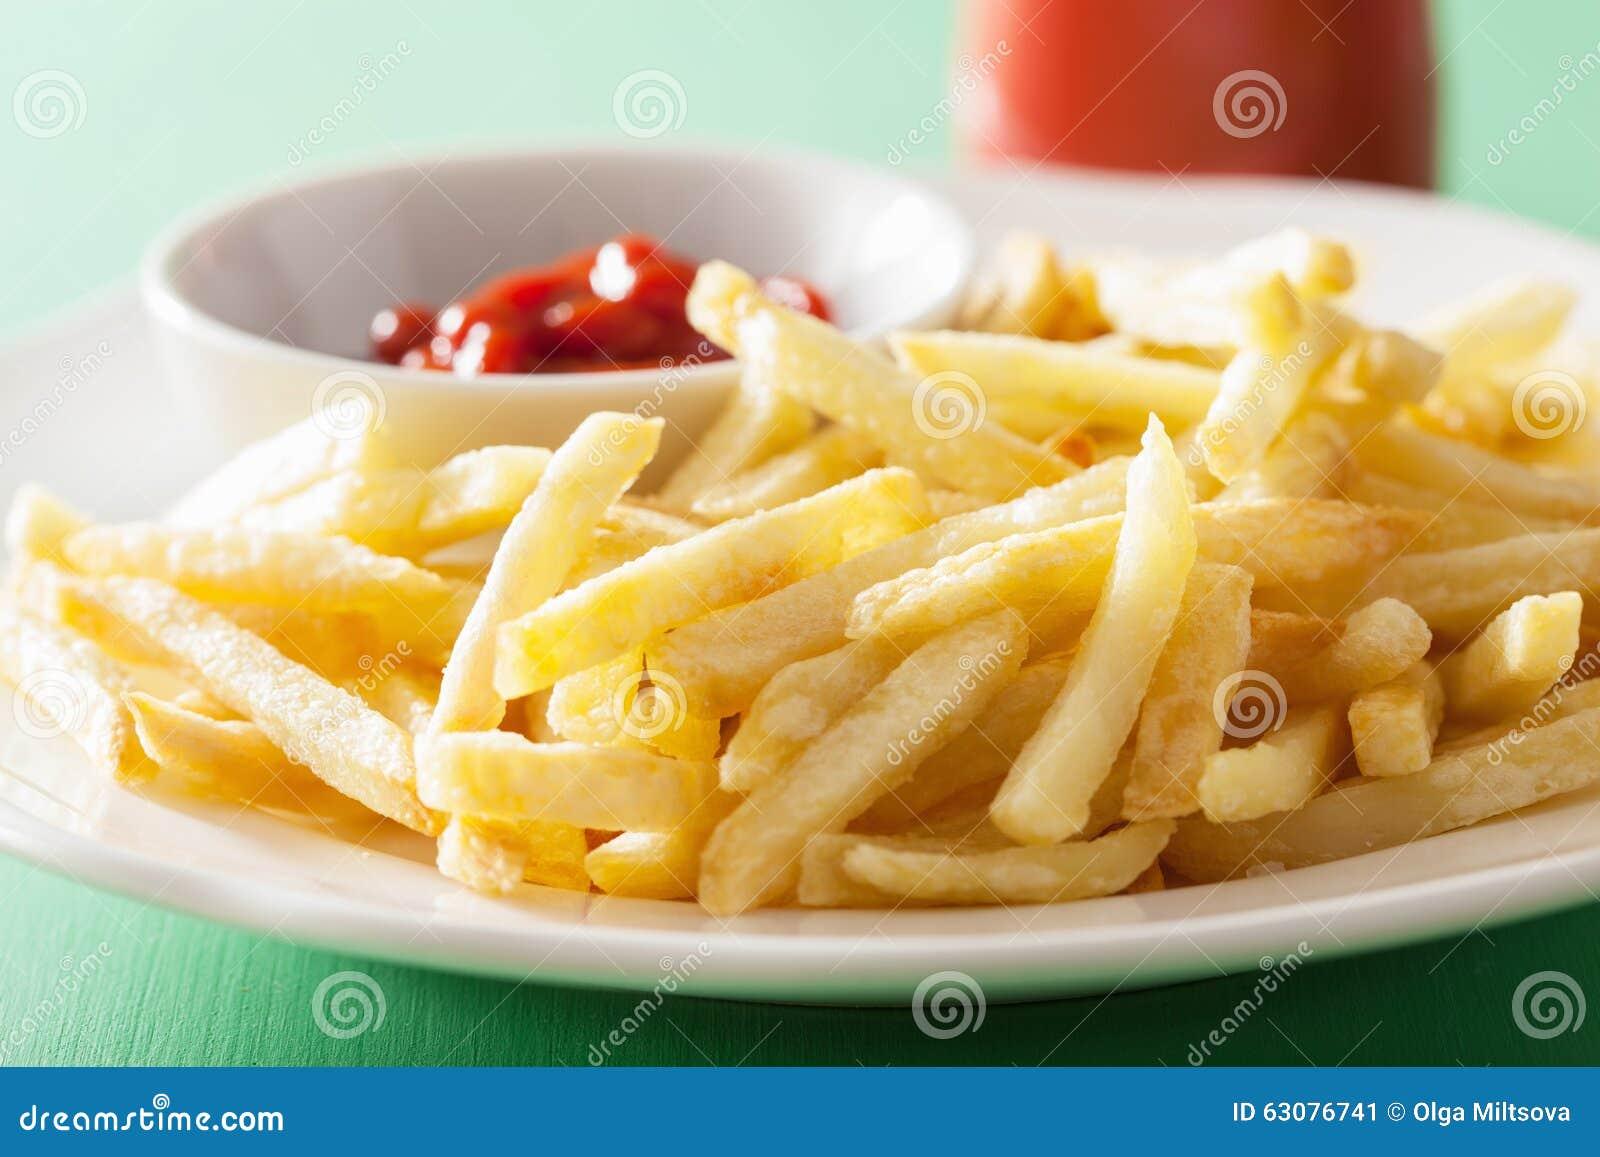 Download Pommes Frites Avec Le Ketchup Au-dessus Du Fond Vert Image stock - Image du puce, gros: 63076741